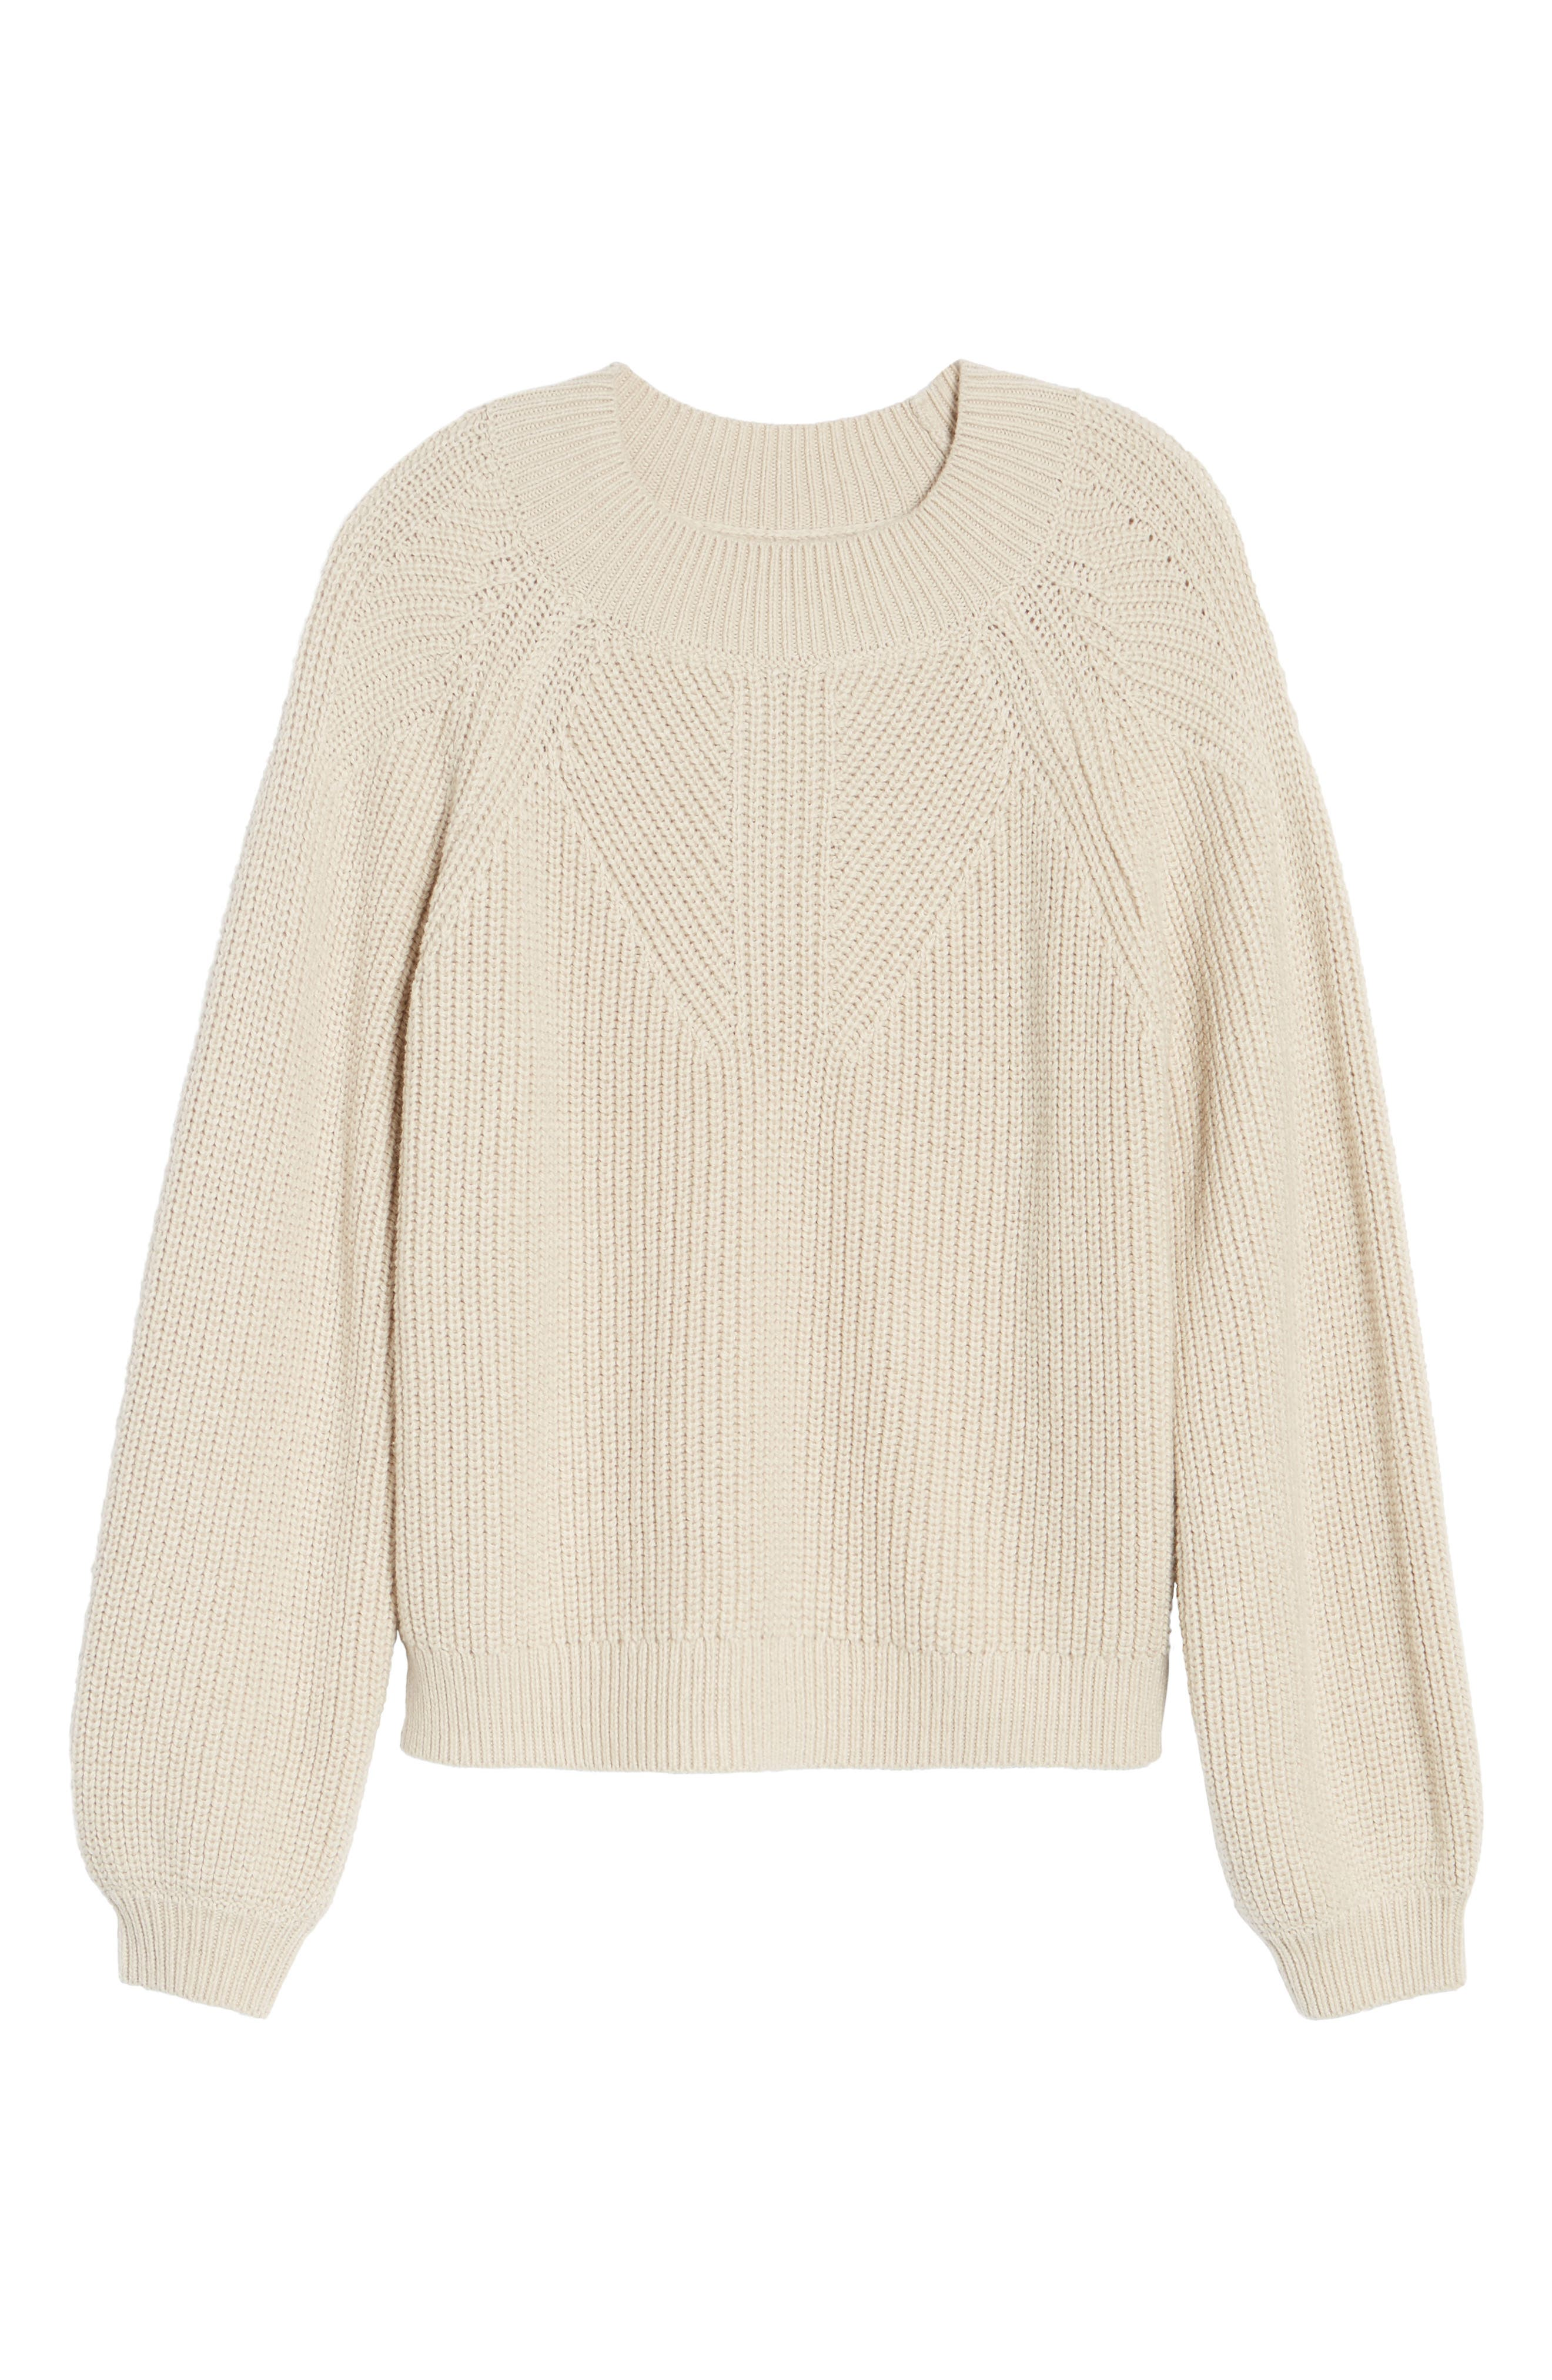 Shaker Stitch Sweater,                             Alternate thumbnail 6, color,                             270